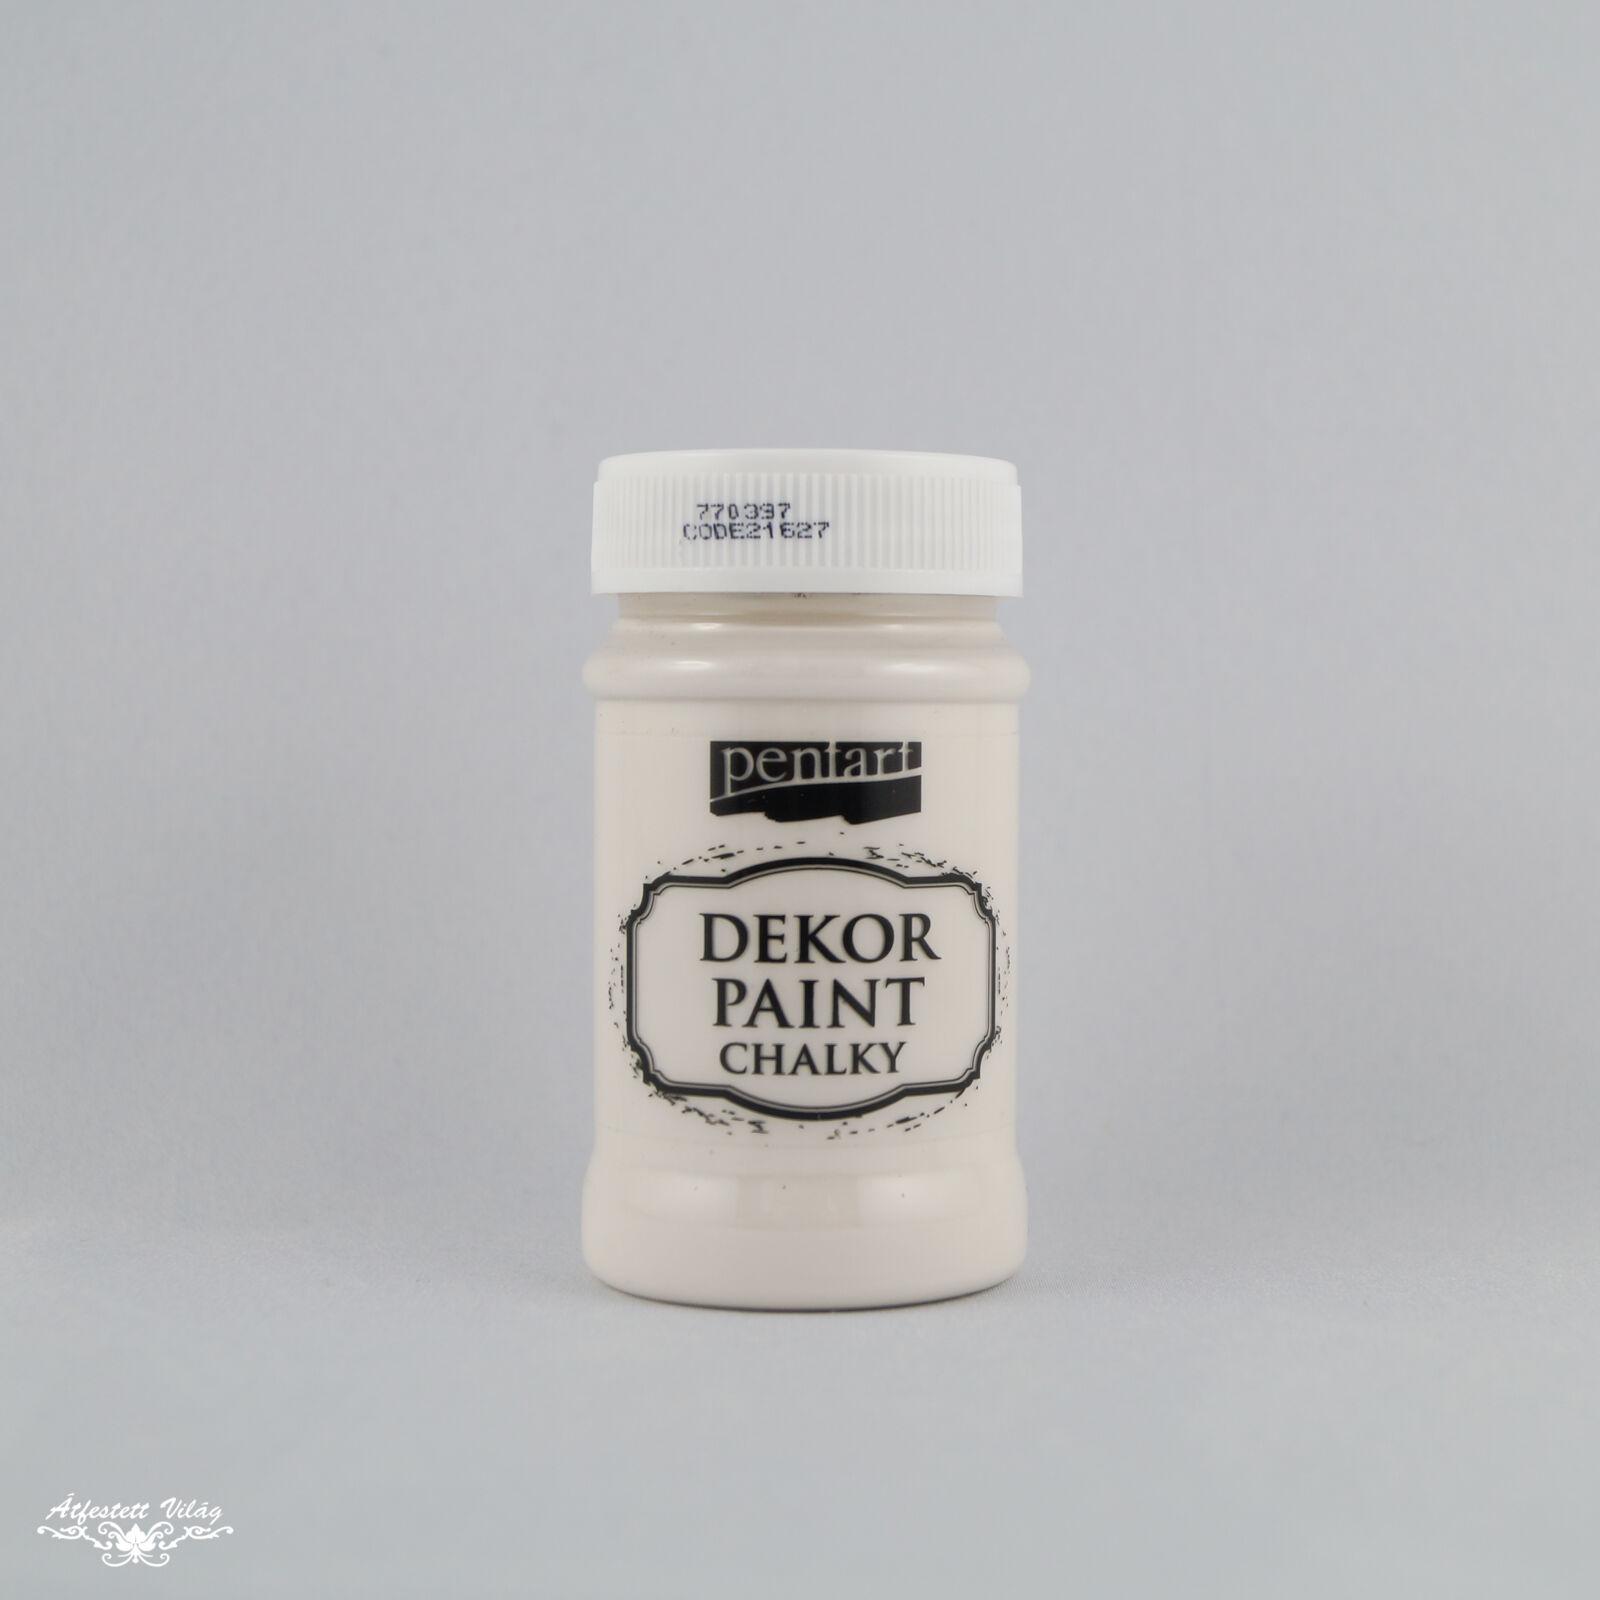 PENTART Dekor Paint - Fehér [100 ml]